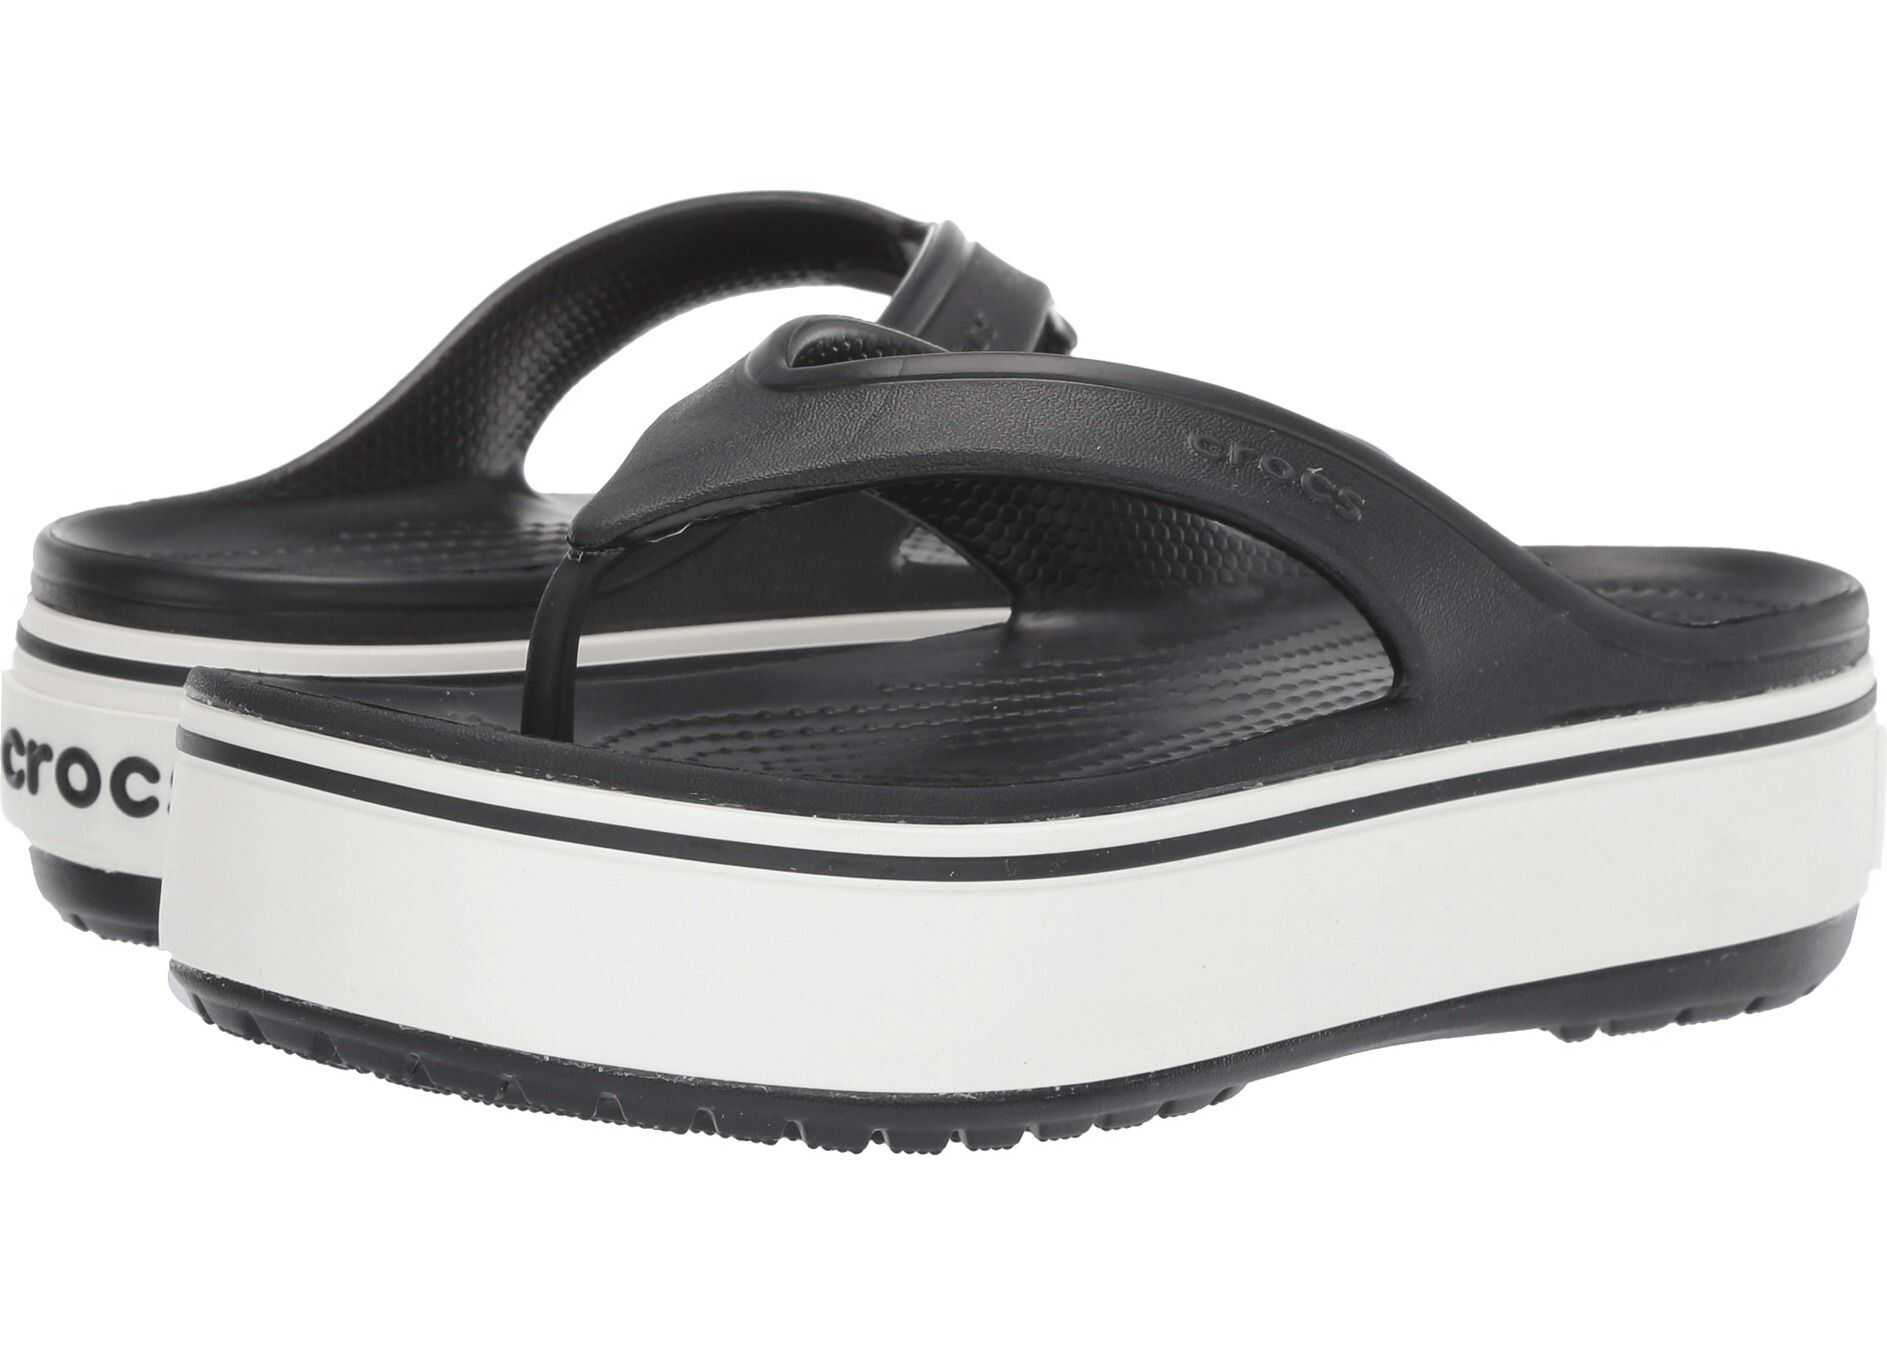 Crocs Crocband Platform Flip Black/White